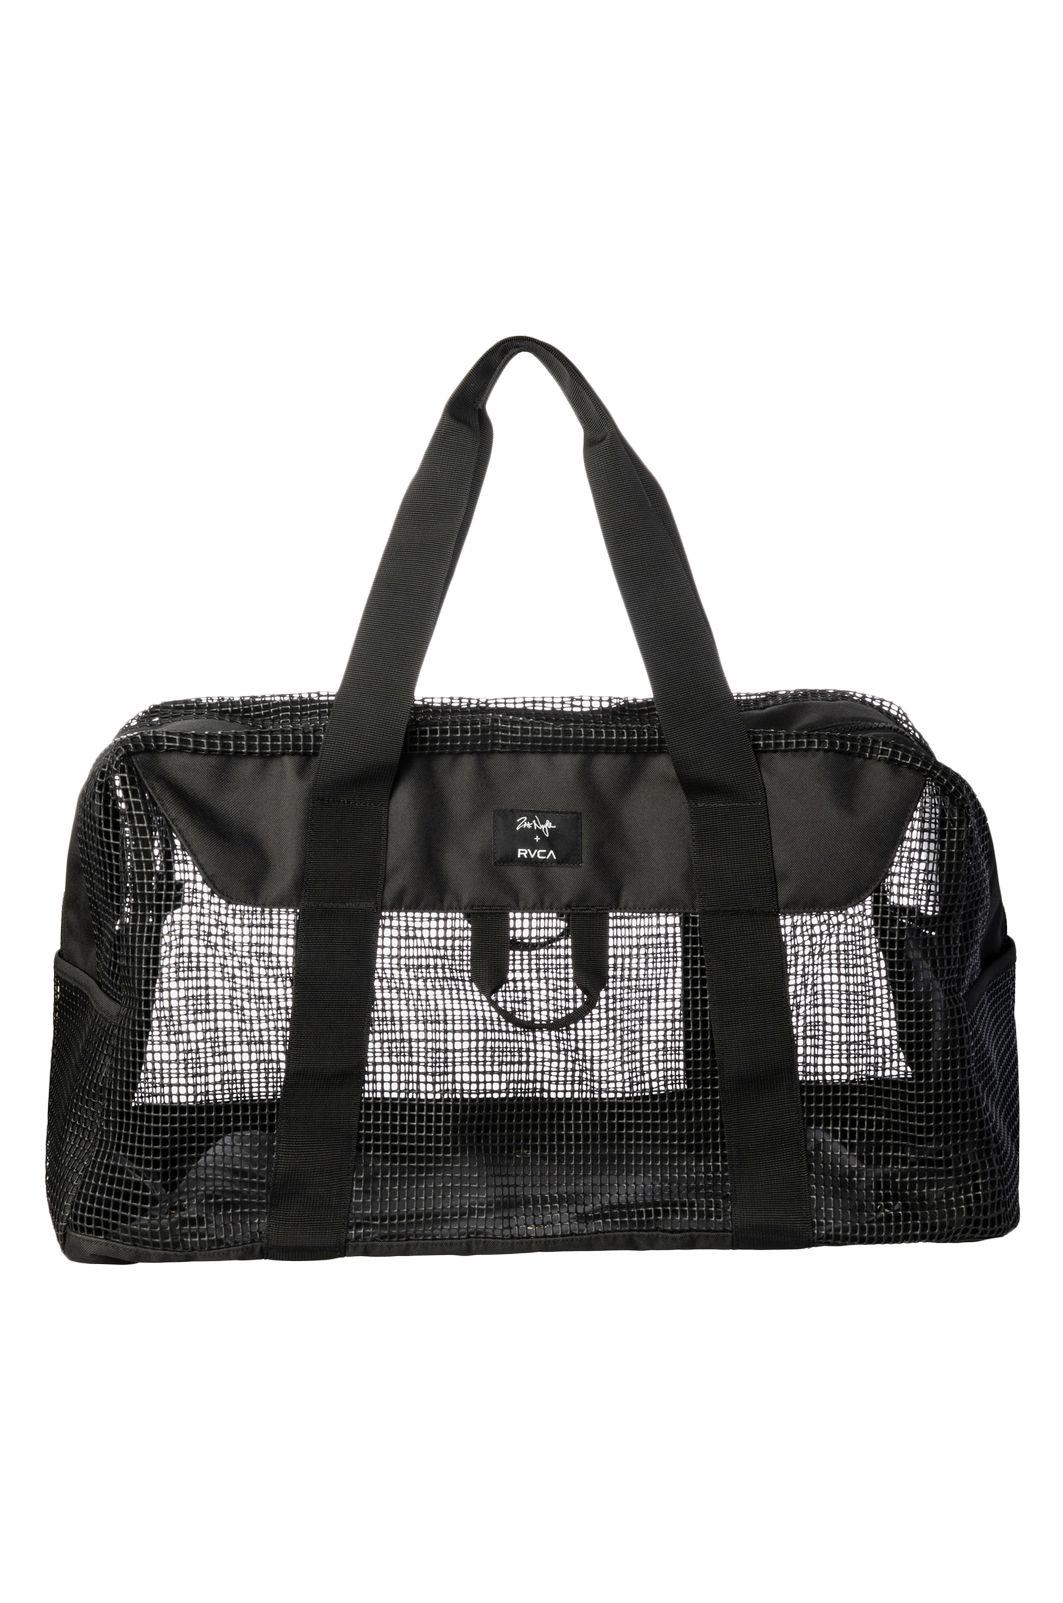 RVCA Bag ZAK NOYLE BEACH Black